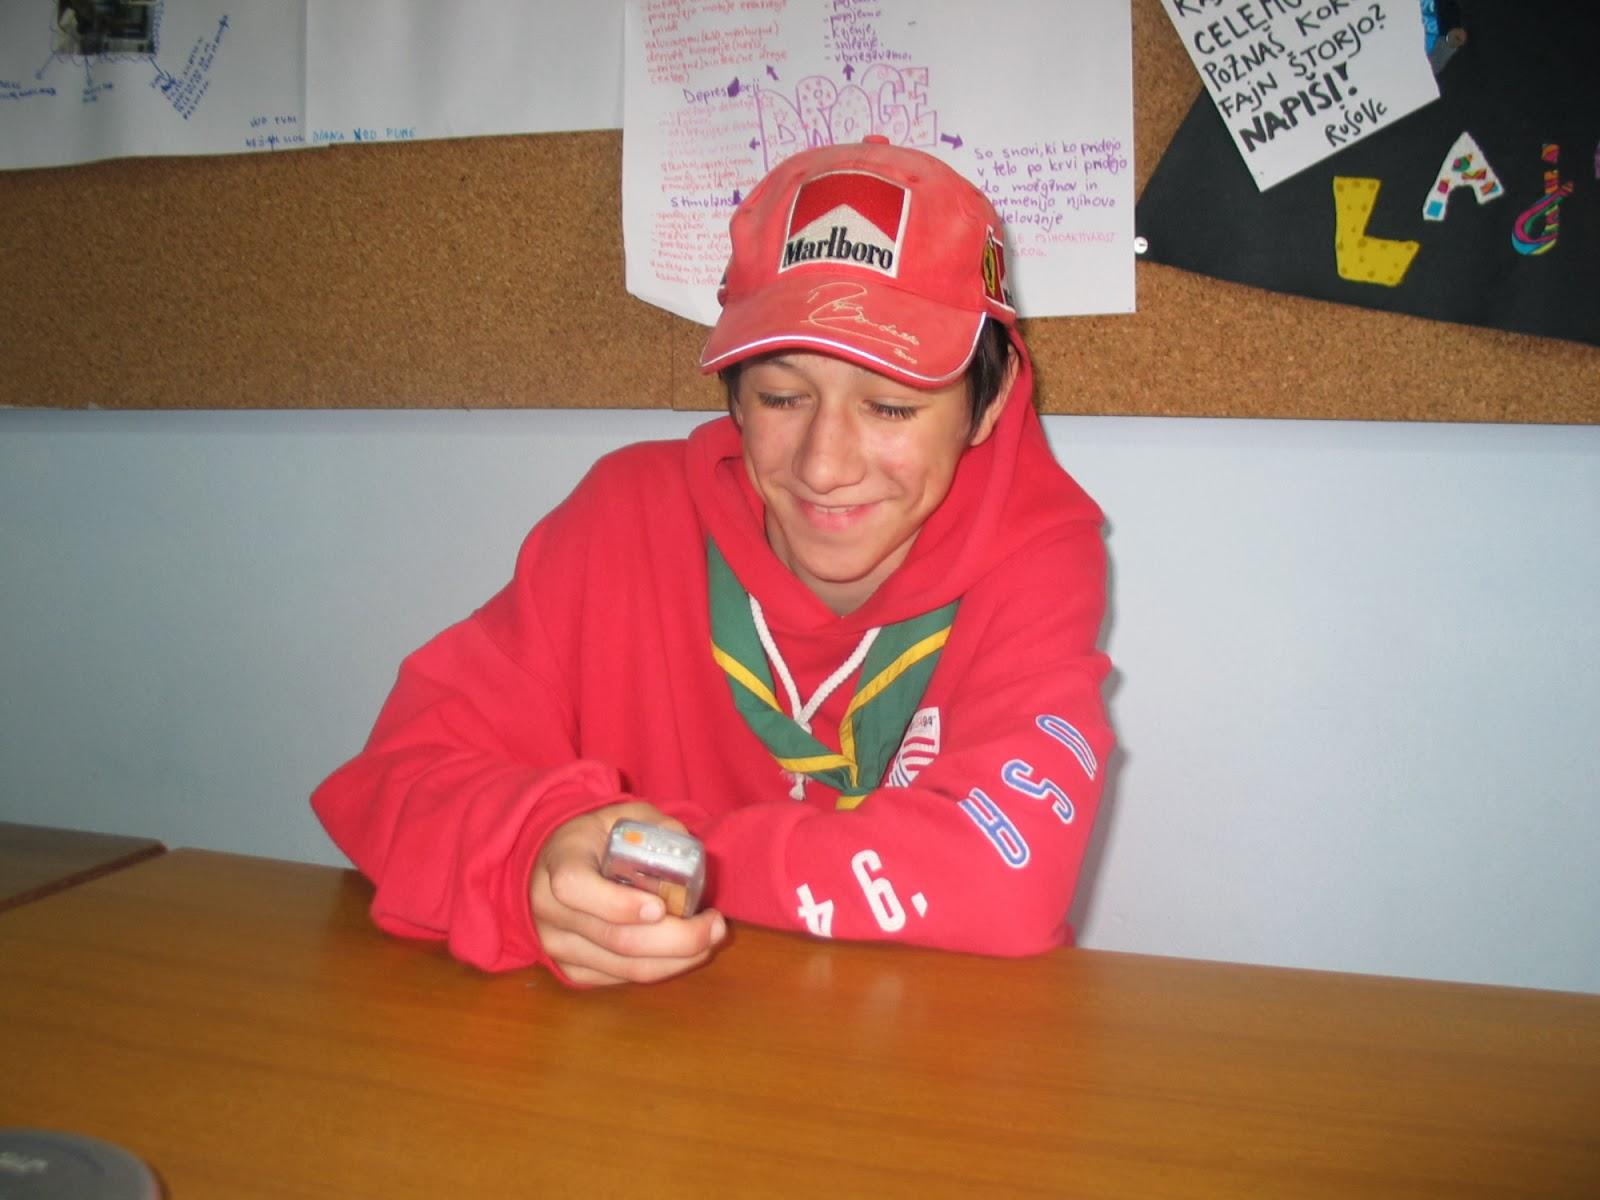 Tabosong, Ilirska Bistrica 2005 - Picture%2B091.jpg